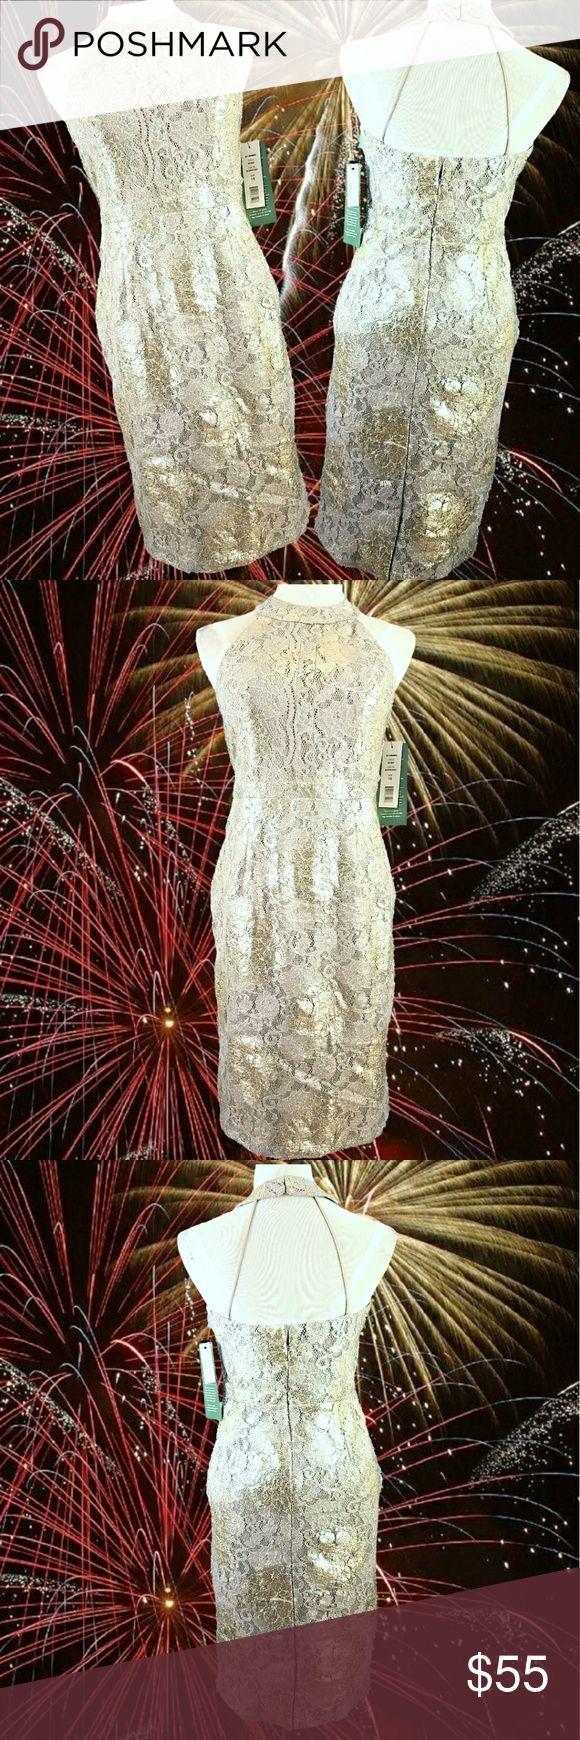 "NWT Gold & Silver Metallic Halter Dress Bust: 36"" Waist: 32"". Hip: 38"" Length: 40"" lightweight metallic printed lace gold & silver lined zip back hand wash  2017606 Scarlett Dresses"